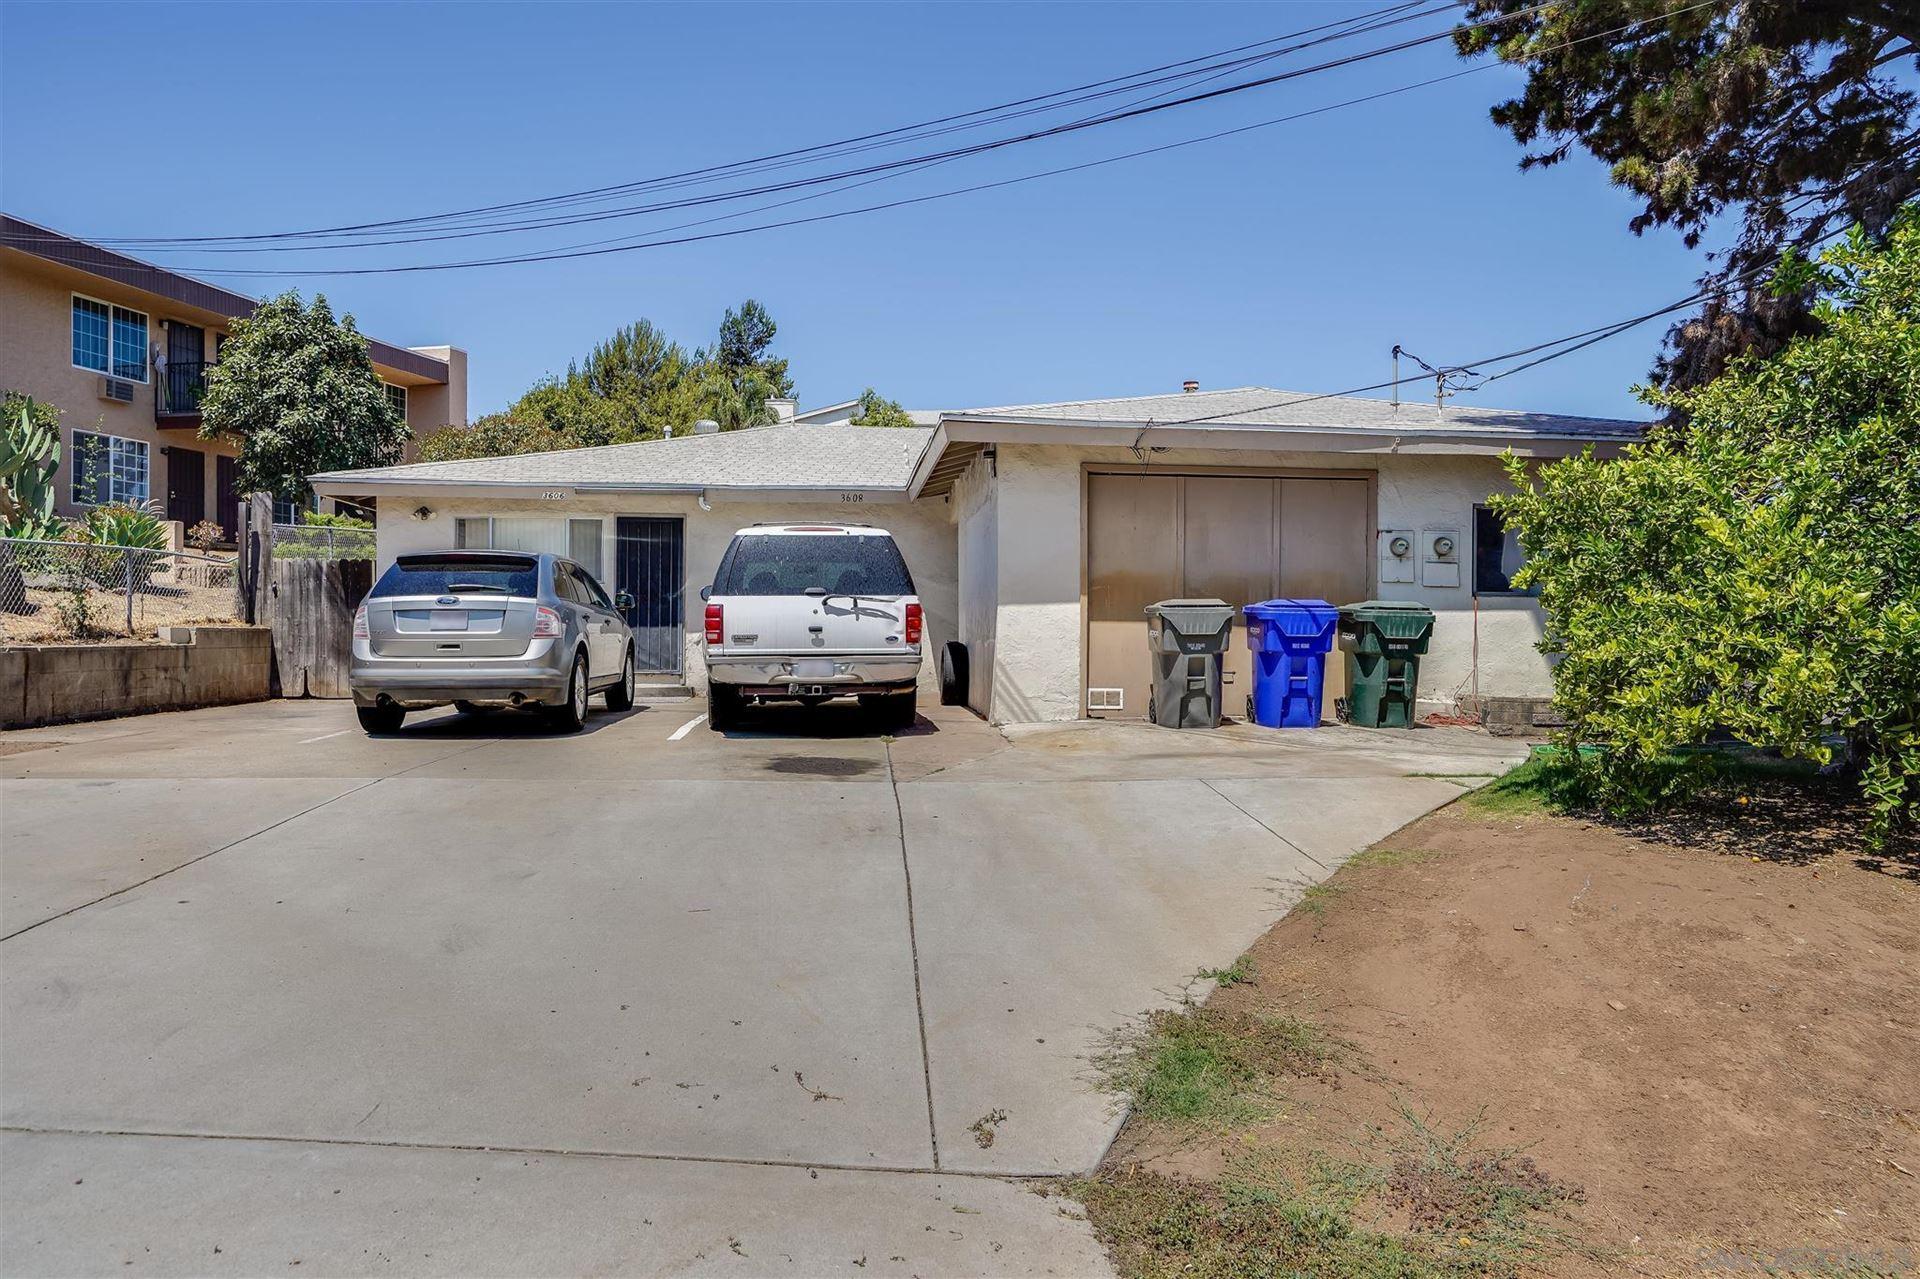 Photo of 3606-08 S Bonita St., Spring Valley, CA 91977 (MLS # 210020757)